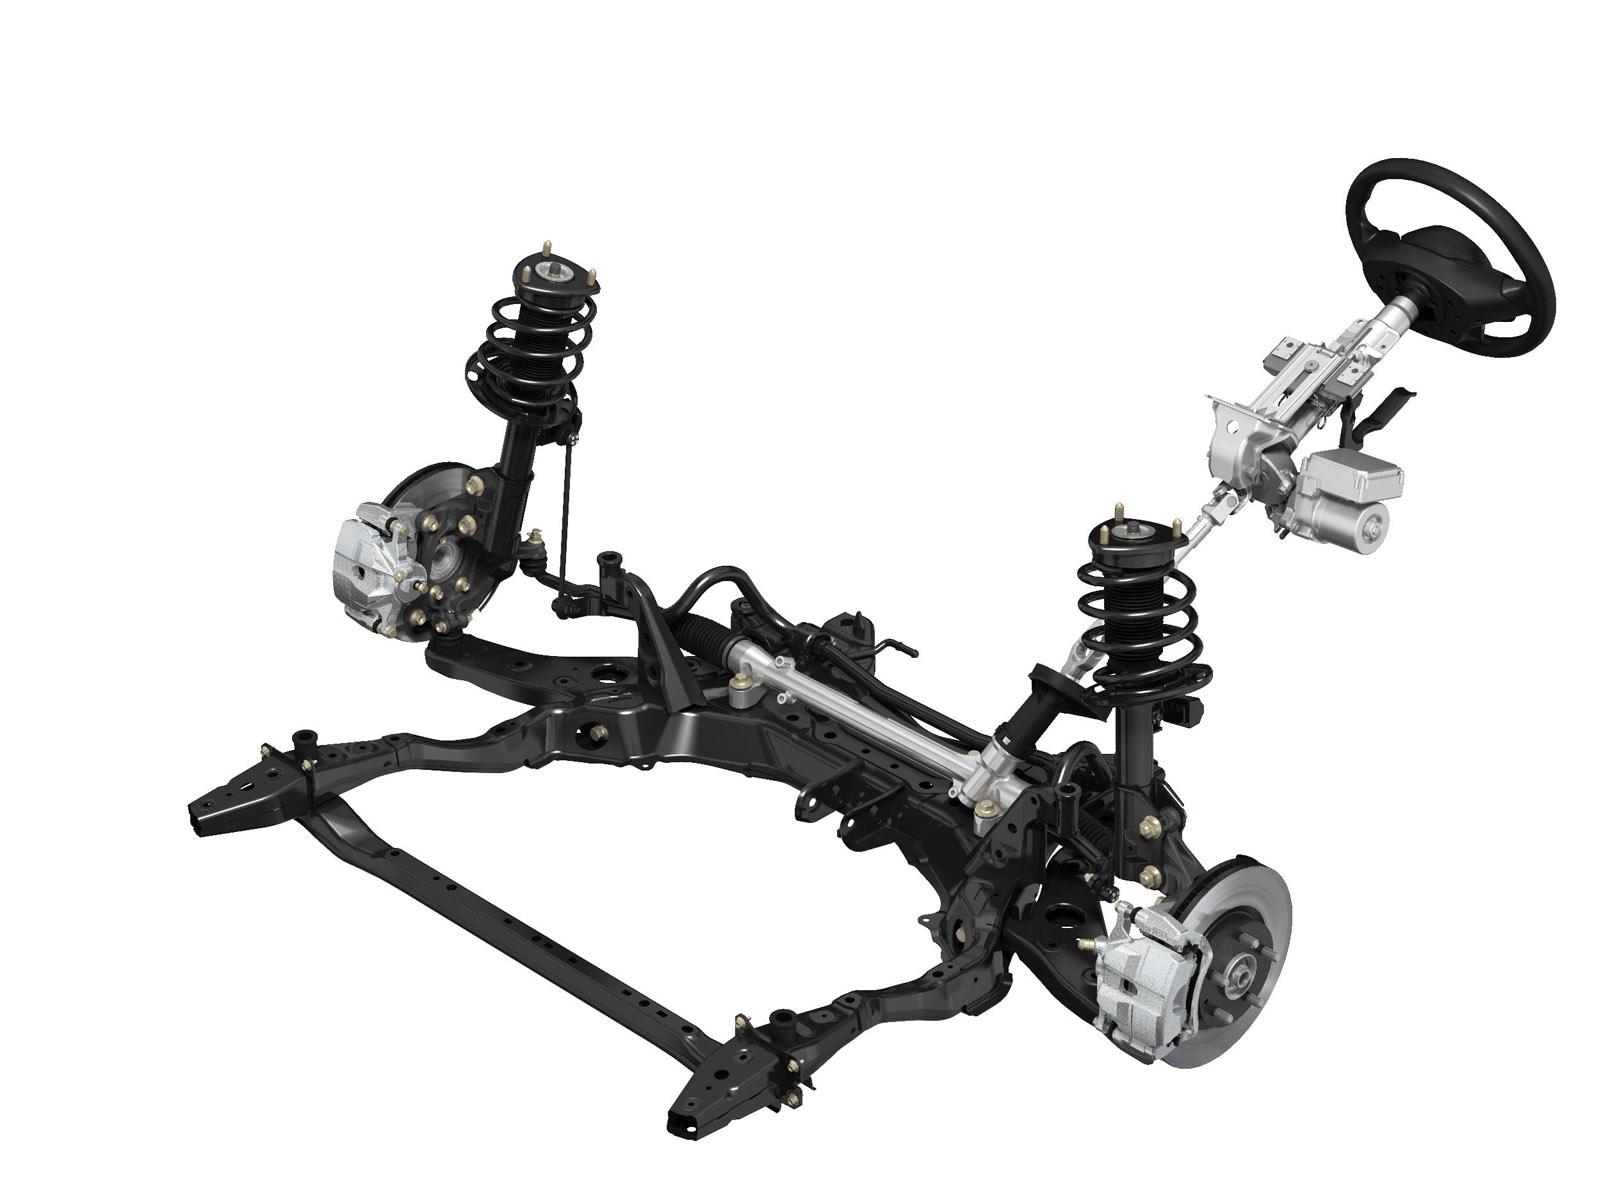 1908_588696_Mazda6_2012_technical_07_SKYACTIV-Chassis